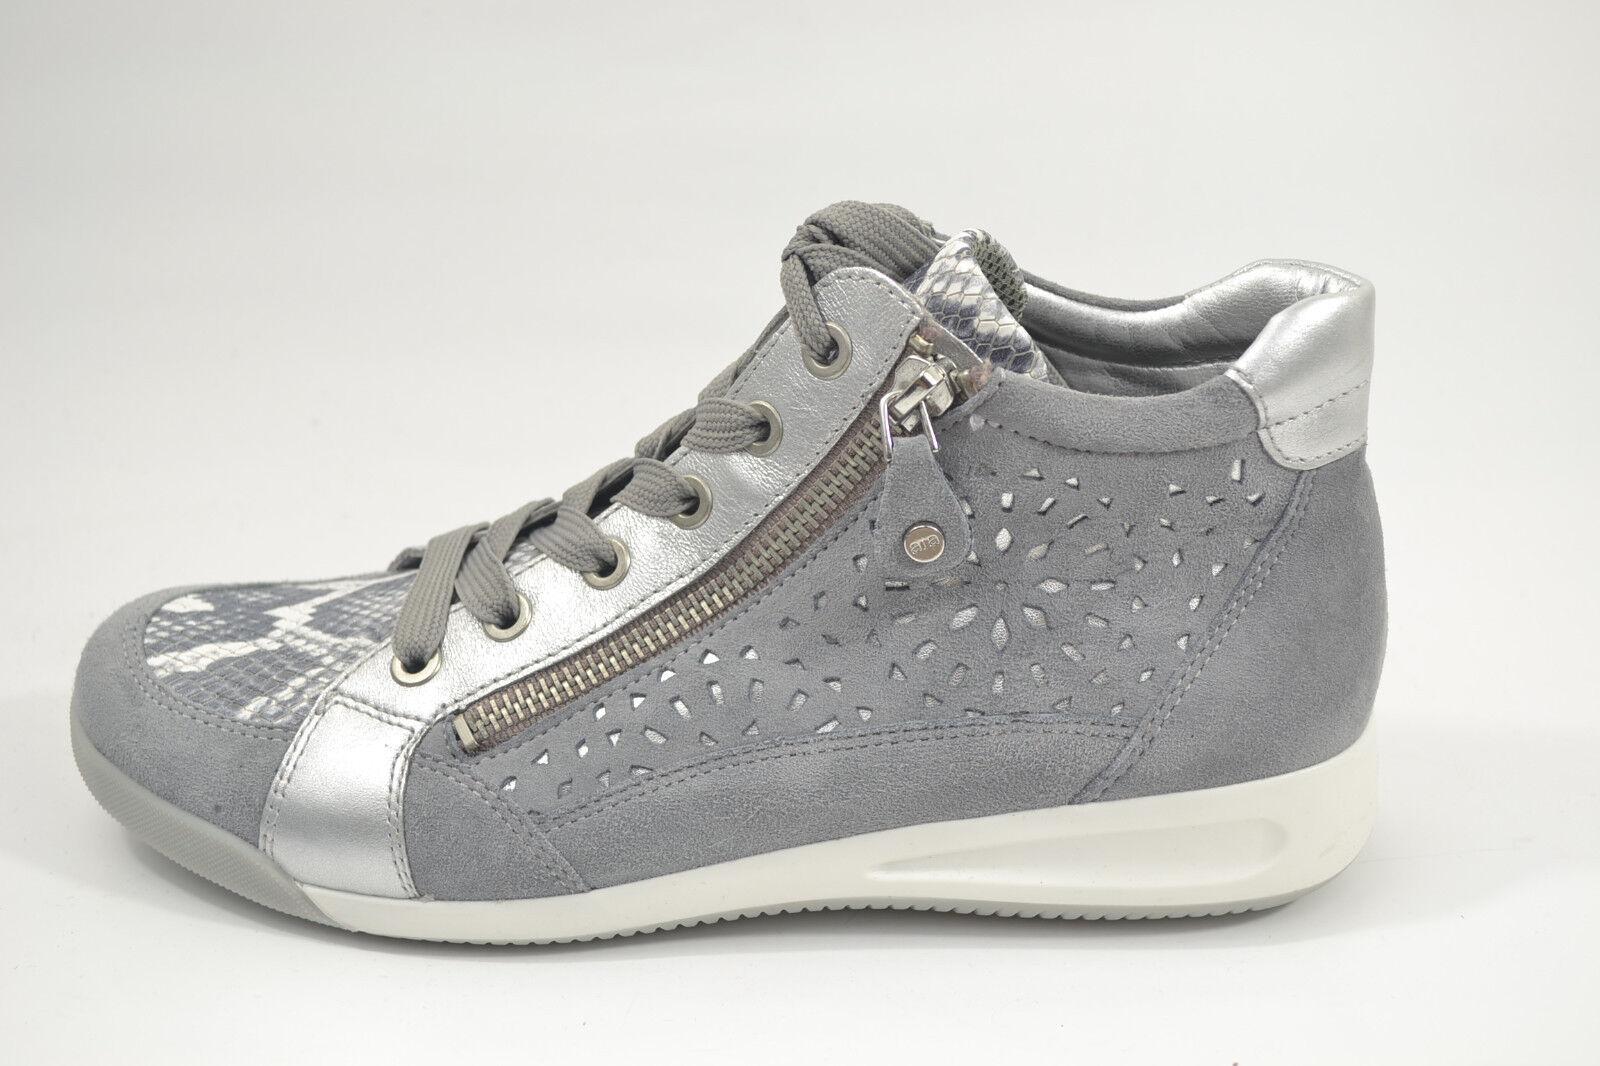 Ara Damen Sneaker Schuhe Stiefel Stiefeletten NEU 12-34441-07 grau NEU Stiefeletten ROTUZIERT 5f0406